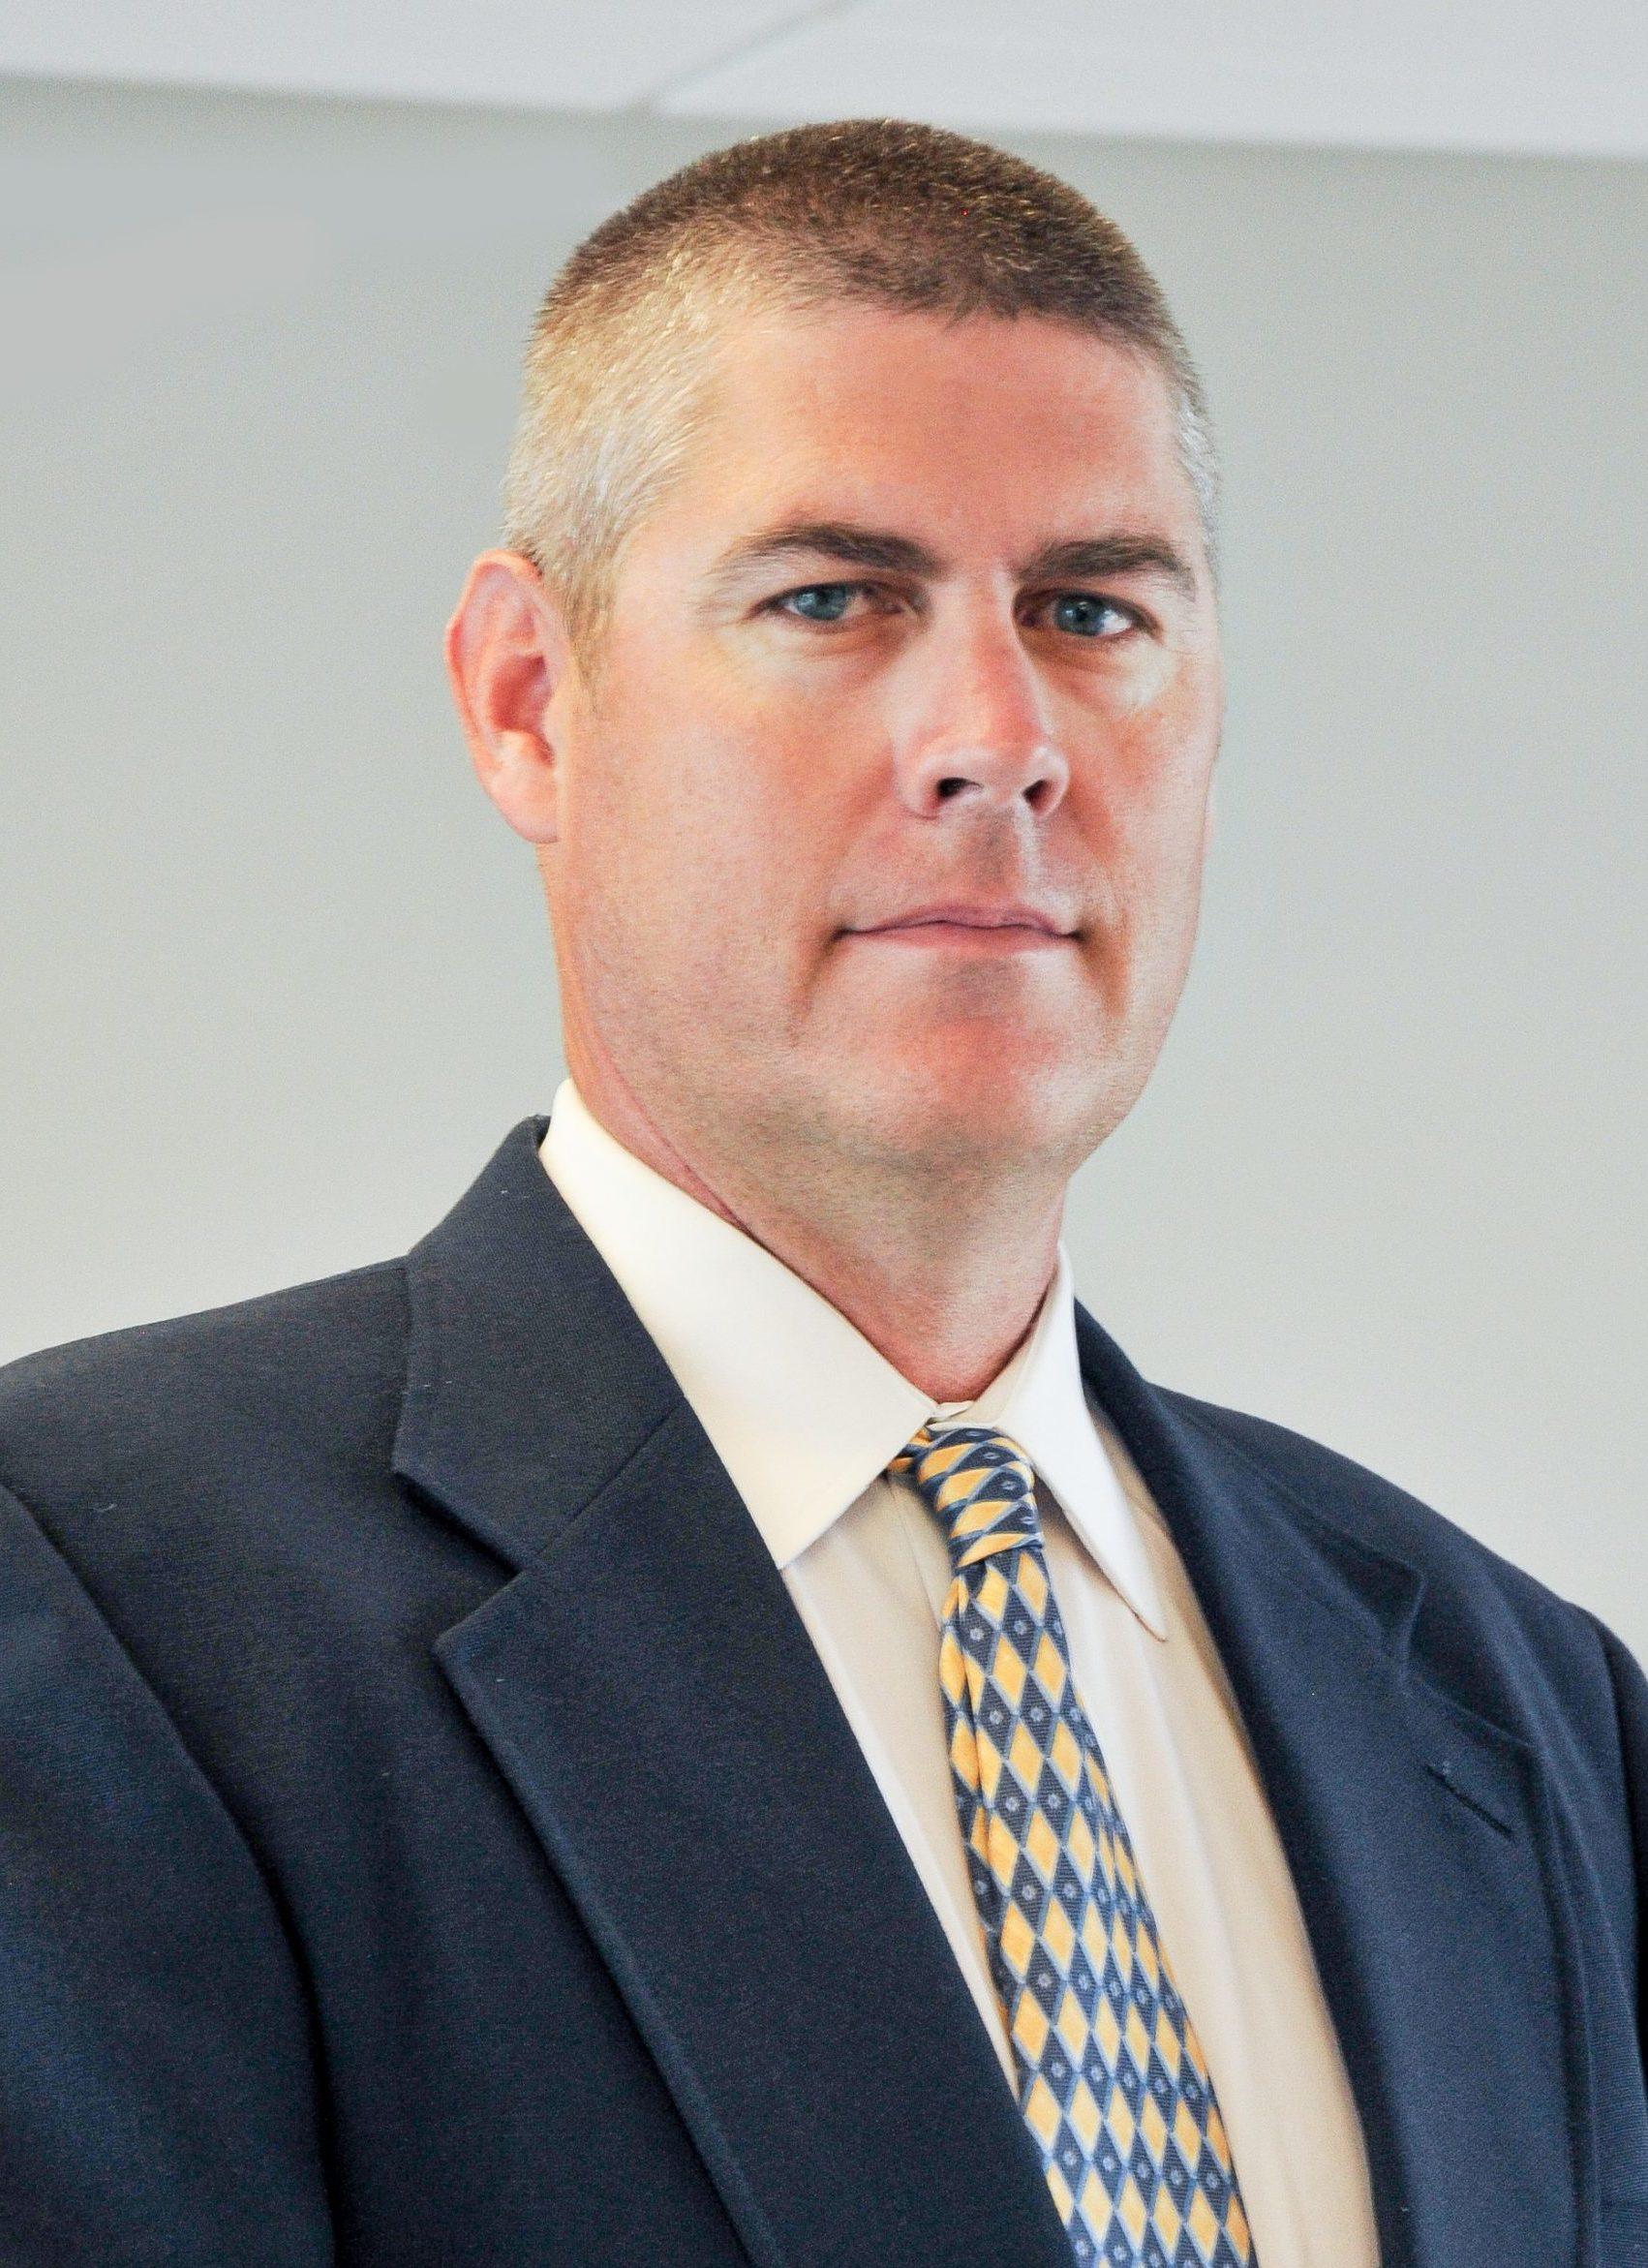 Marcus Balch